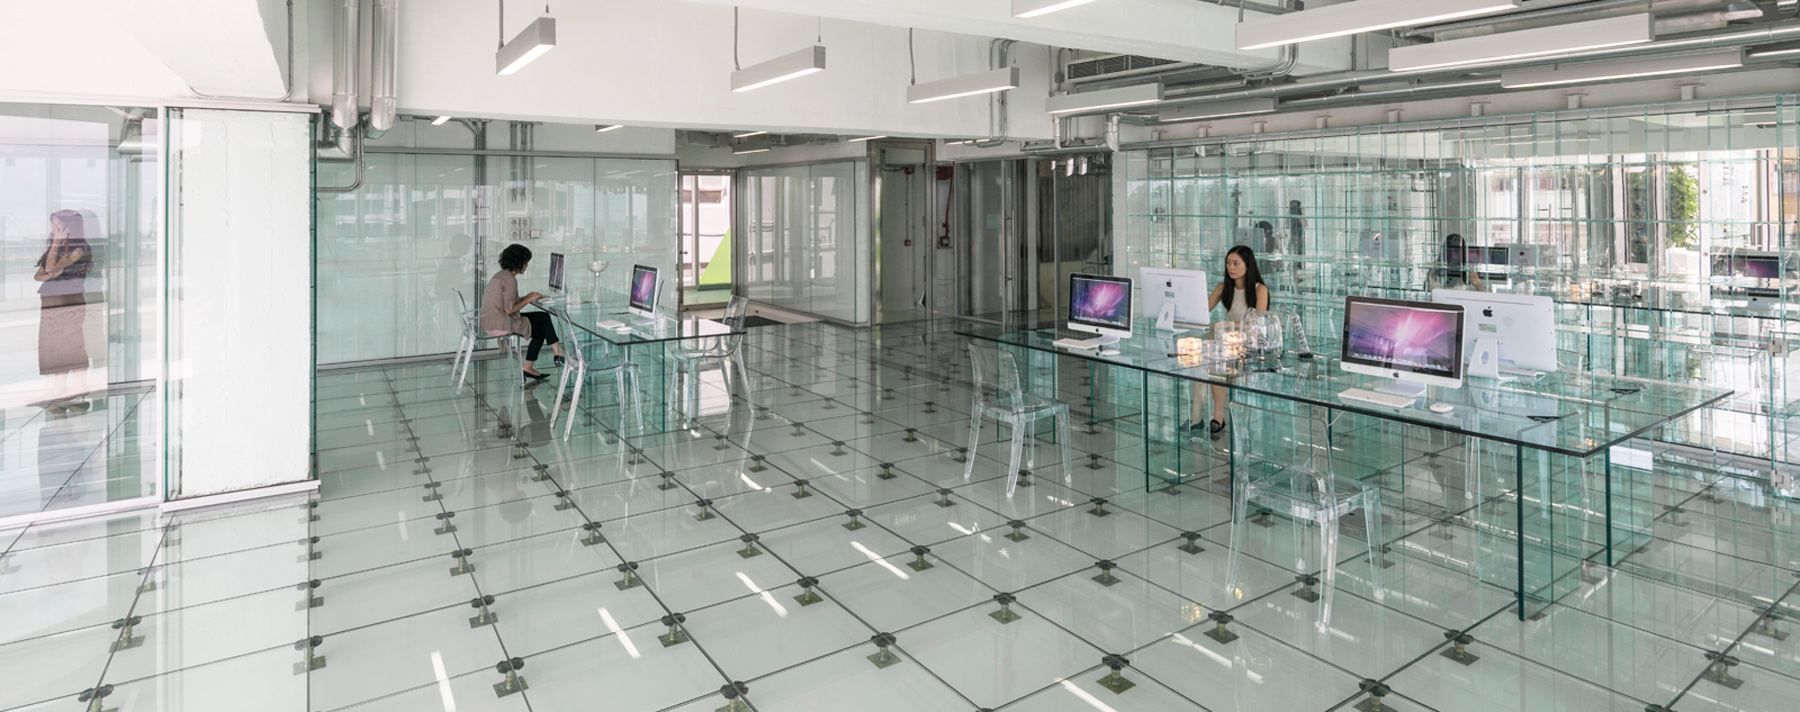 glass office by the mvrdv designers 1 Glass office by the MVRDV designers